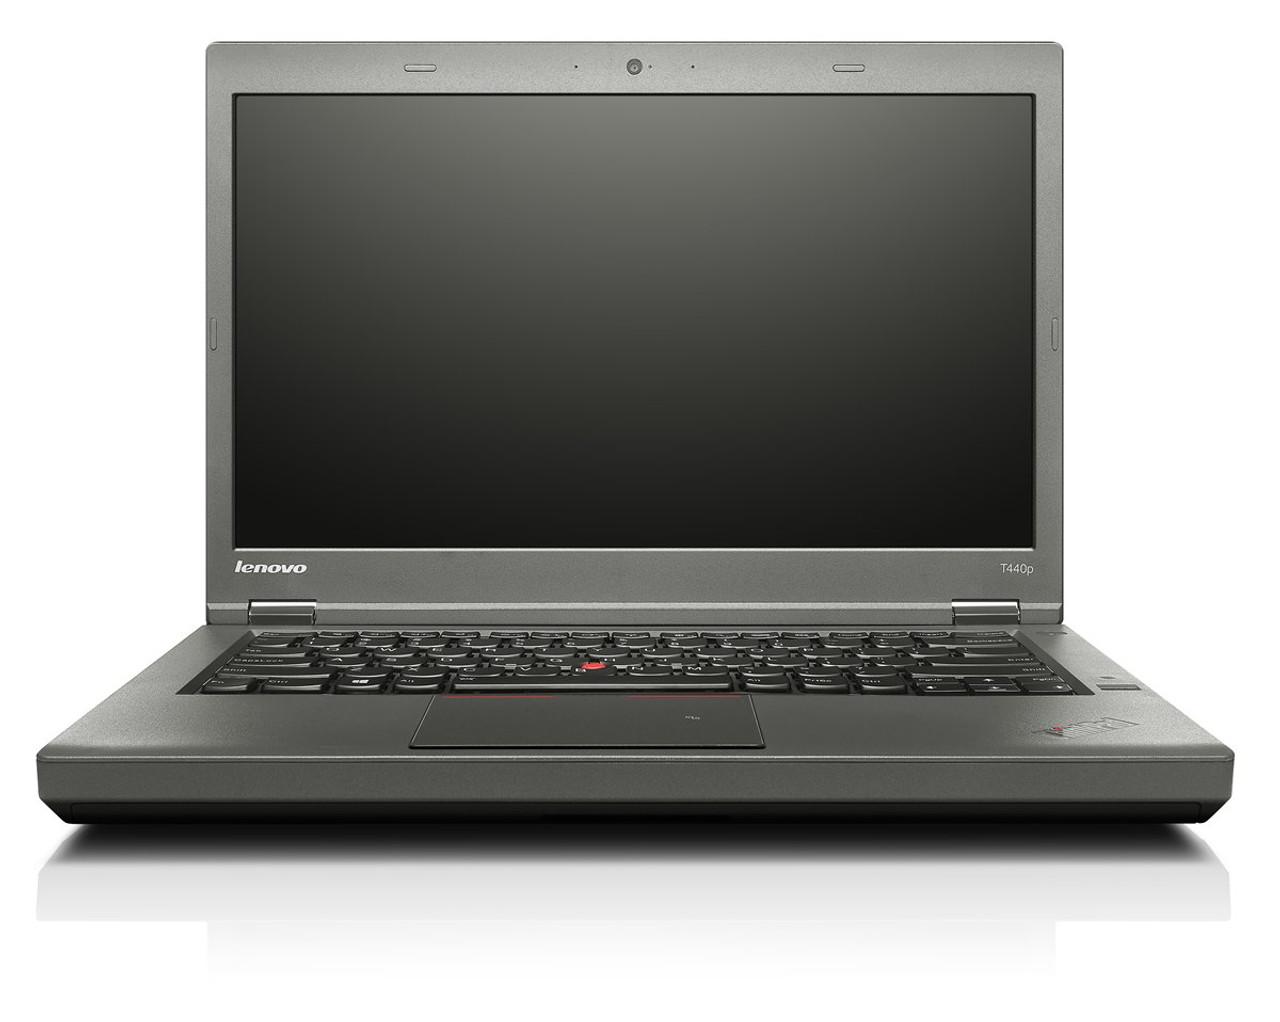 IBM Lenovo Thinkpad T440p Laptop Core i5 2.5GHz, 8GB